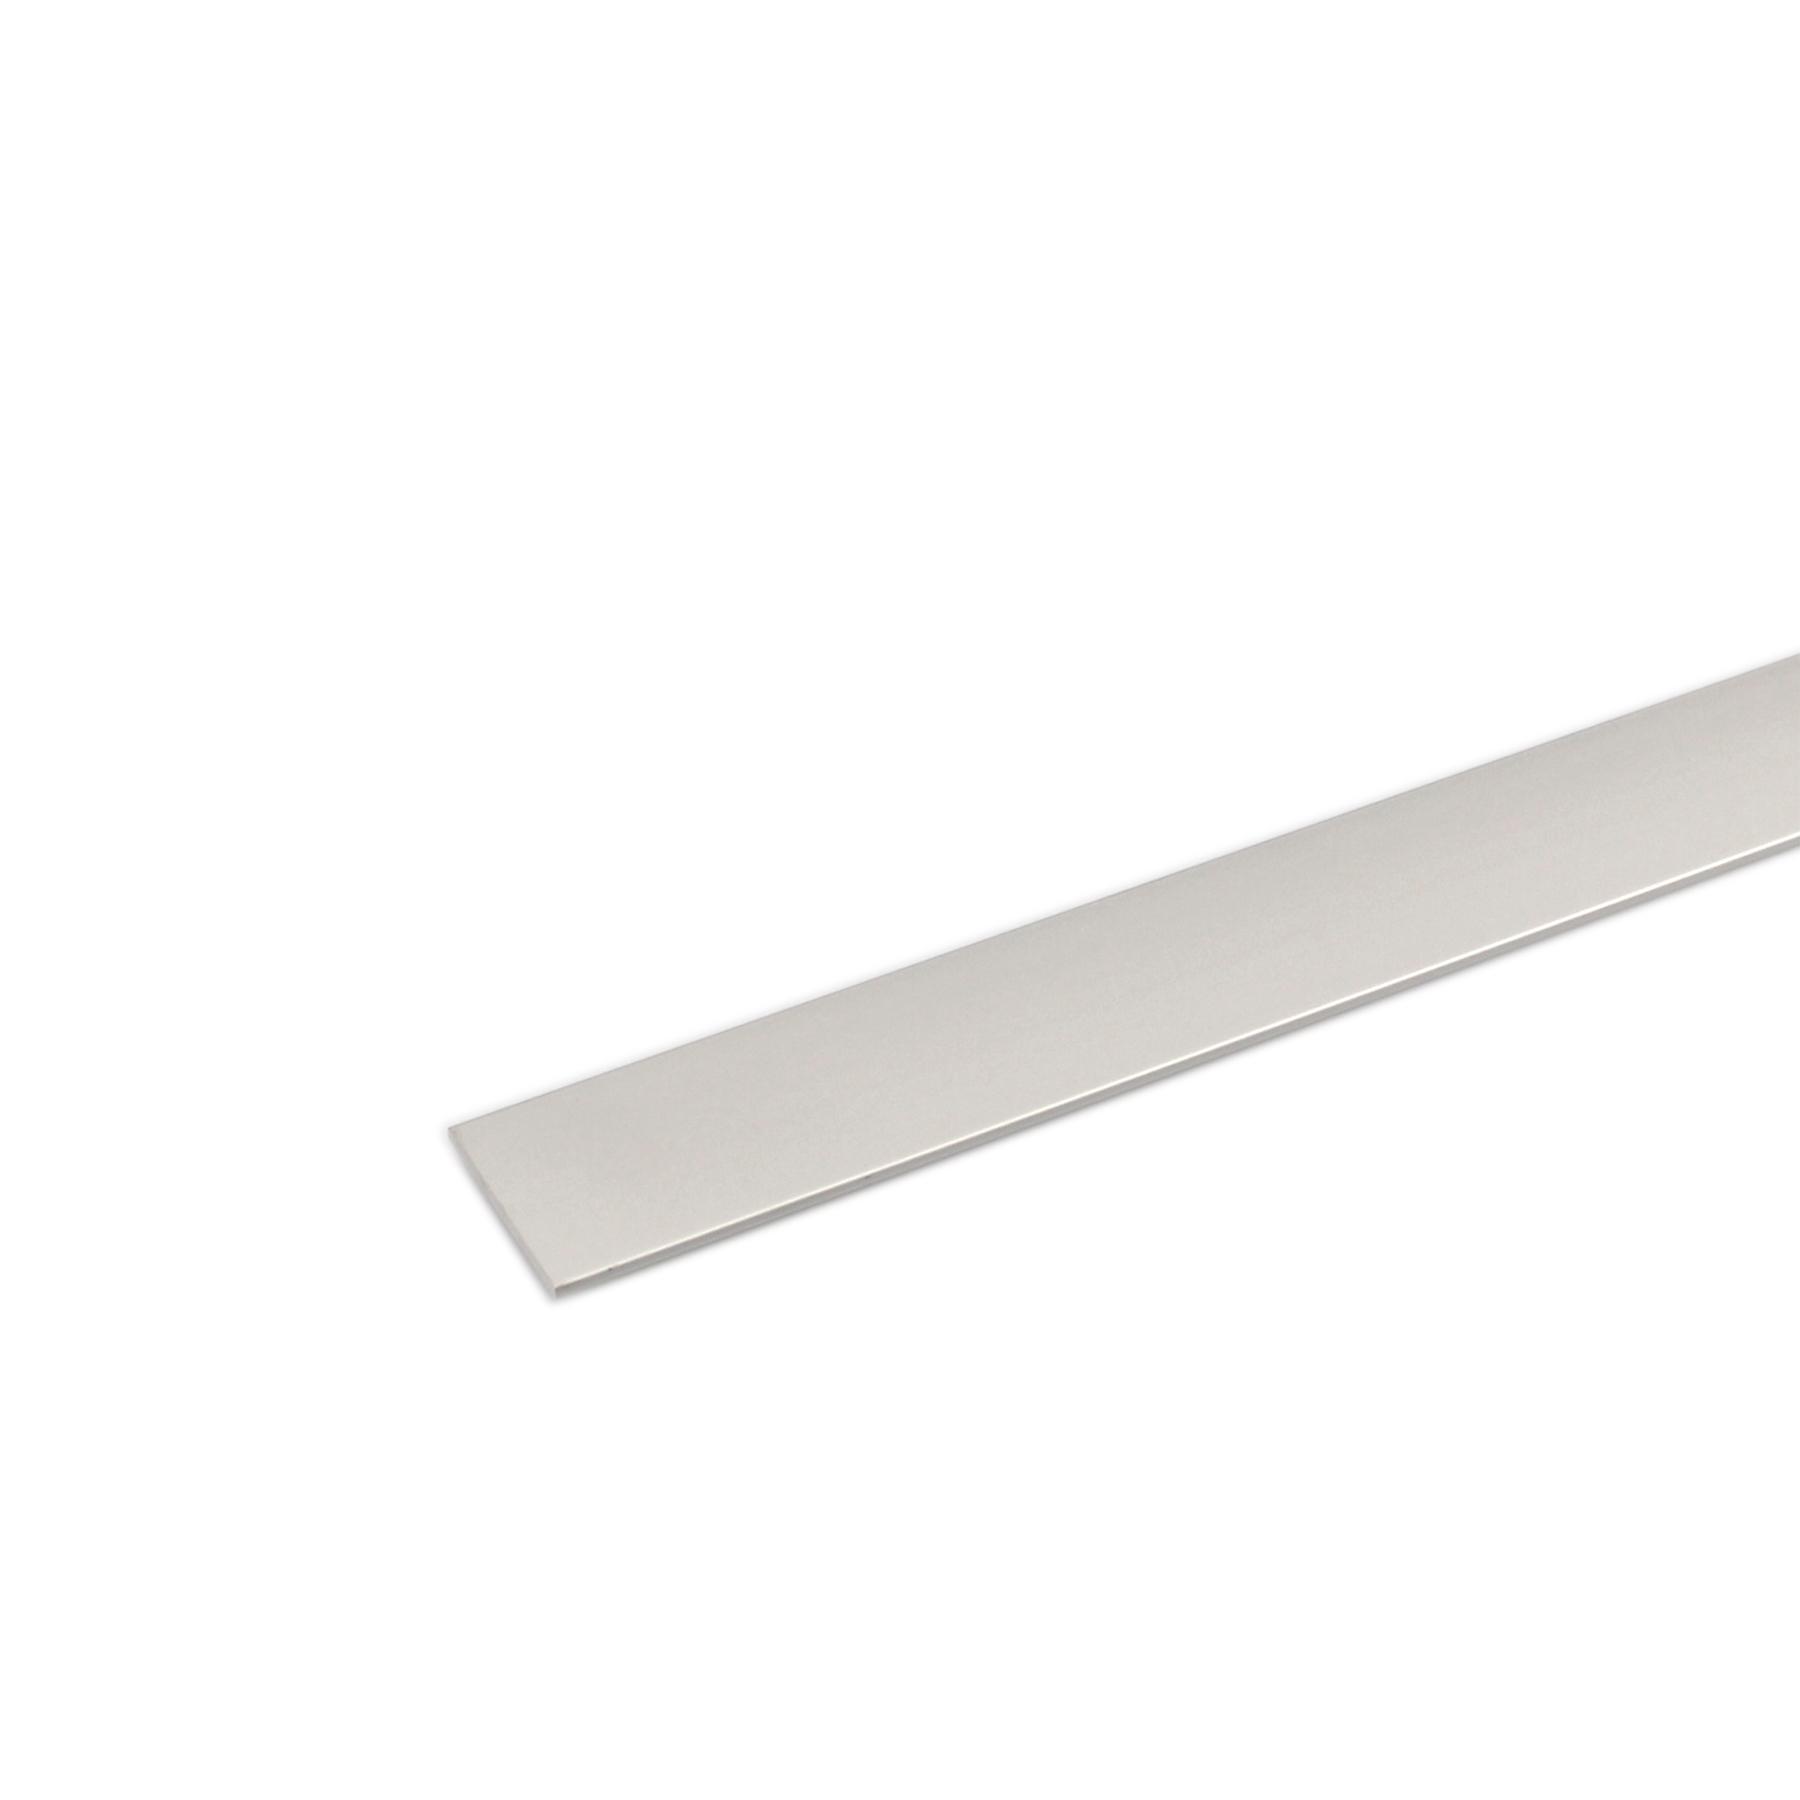 Perfil Plano Alumínio Anodizado 1mx3cm